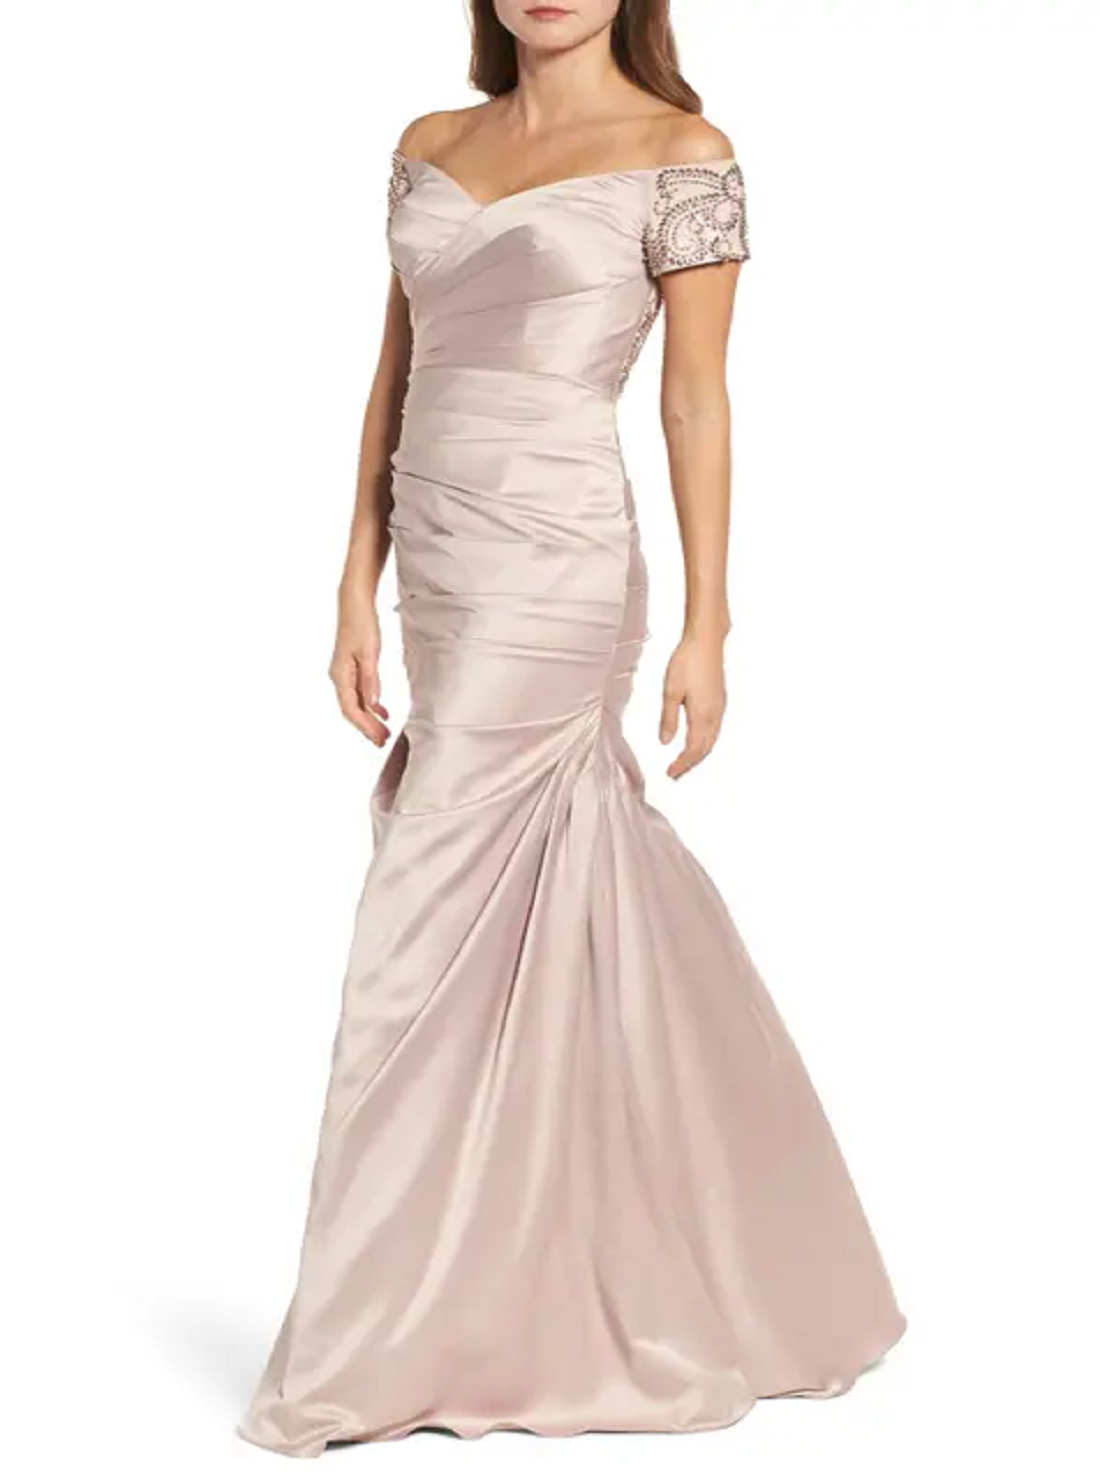 3 Wholesale Satin Maxi Dress